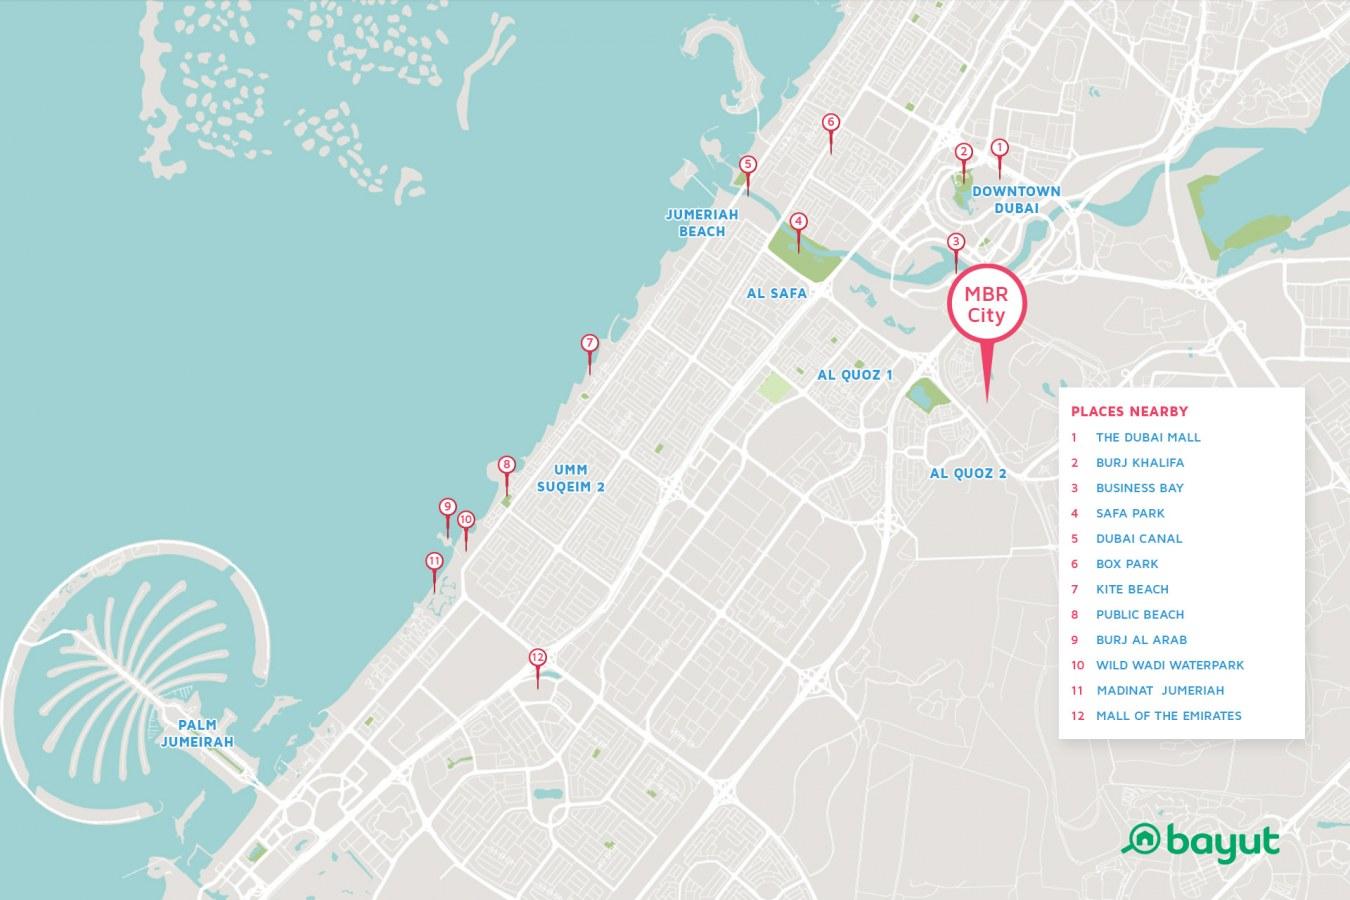 Dubai Maps on